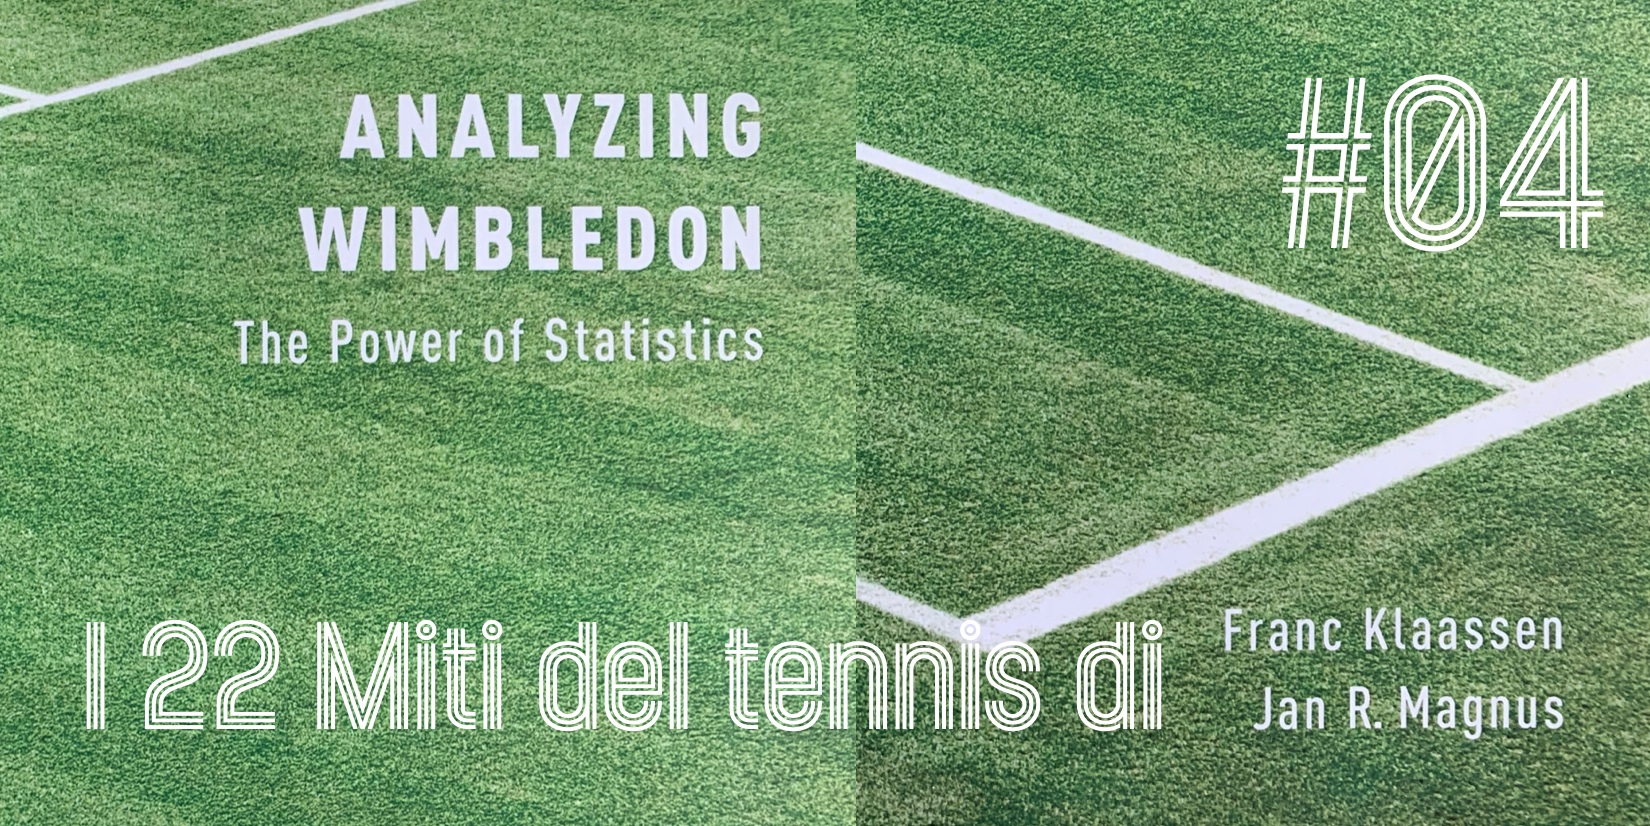 I 22 miti del tennis di Klaassen & Magnus – Mito 4 - settesei.it